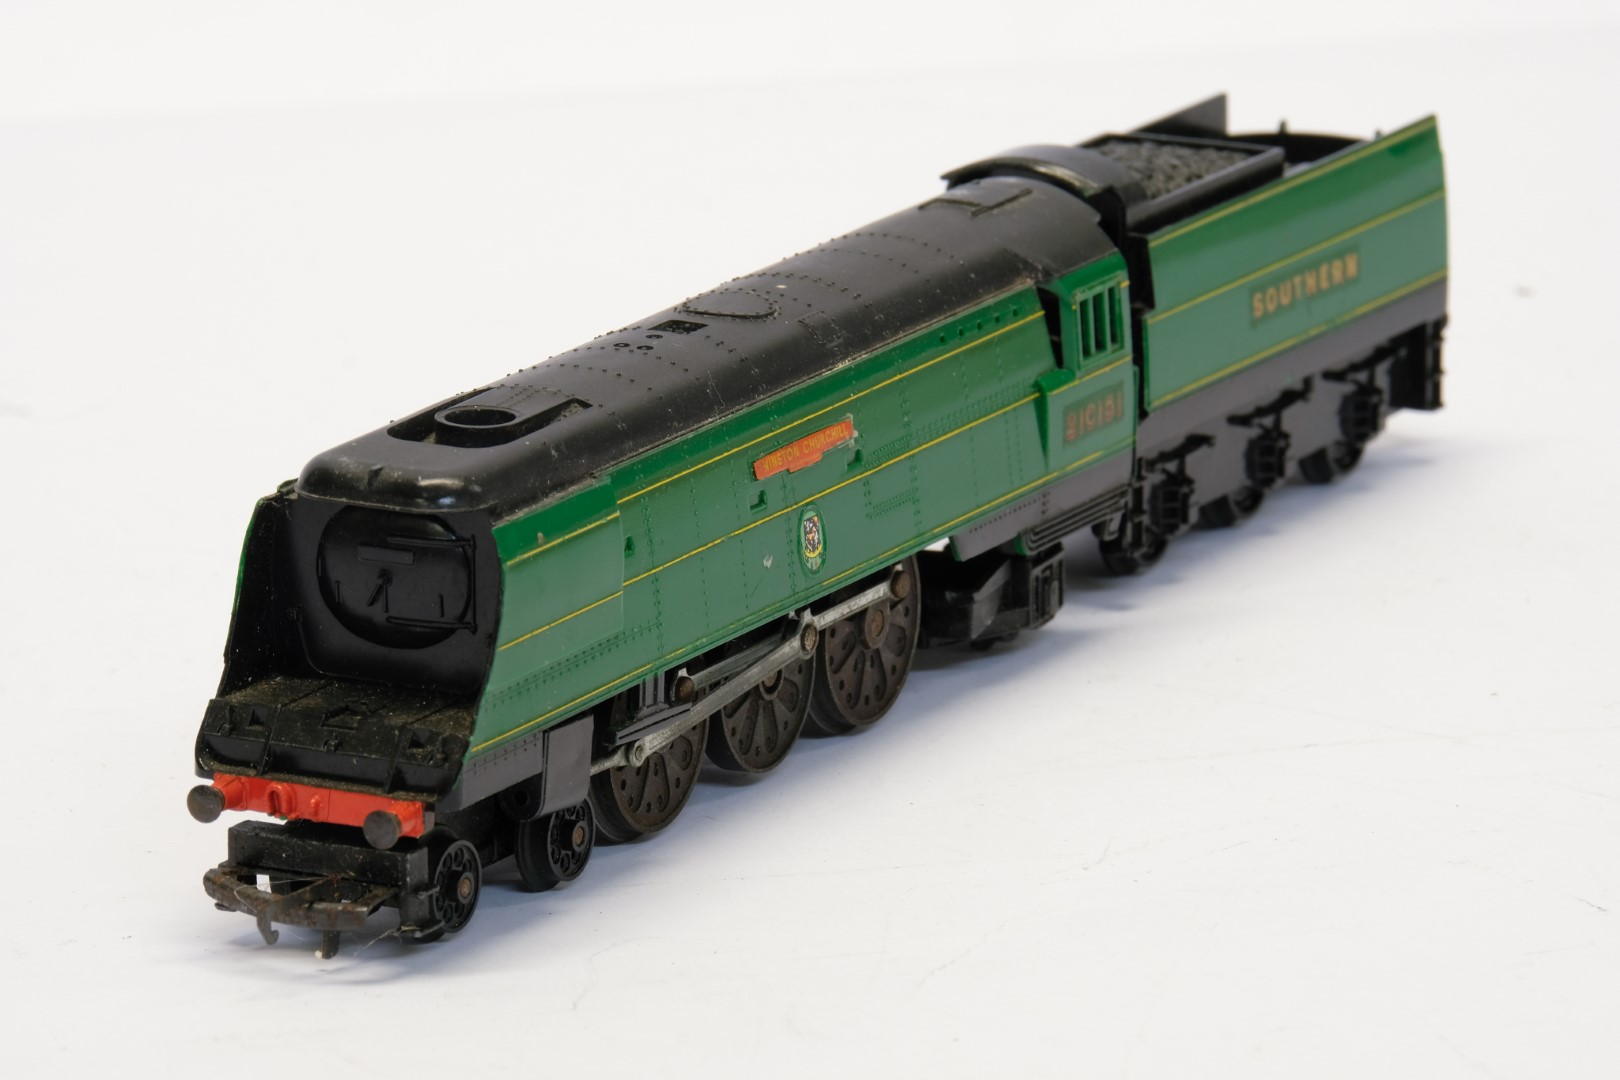 Tri-ang Winston Churchill Locomotive and Tender - Southern - 21C151 - No Box - Image 2 of 3